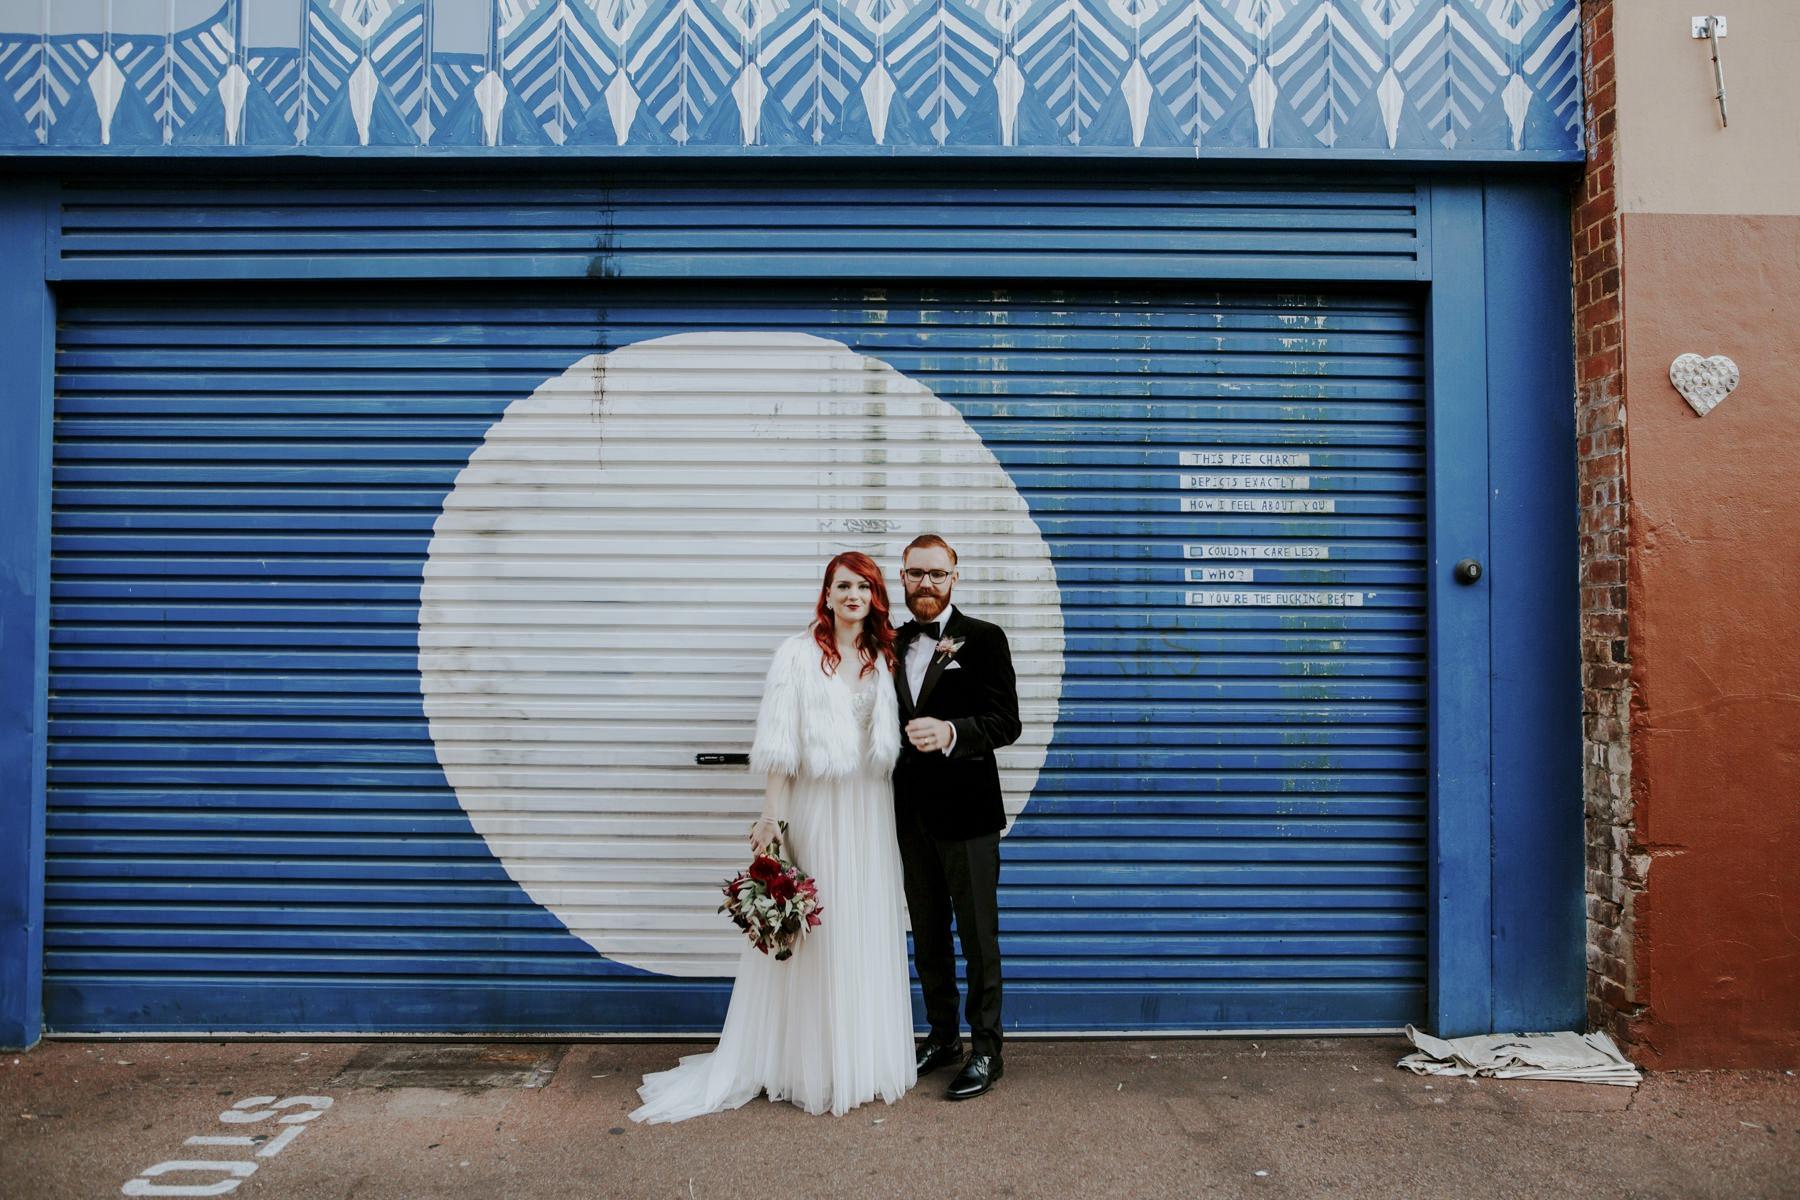 flour-factory-wedding_perth-city-wedding-149